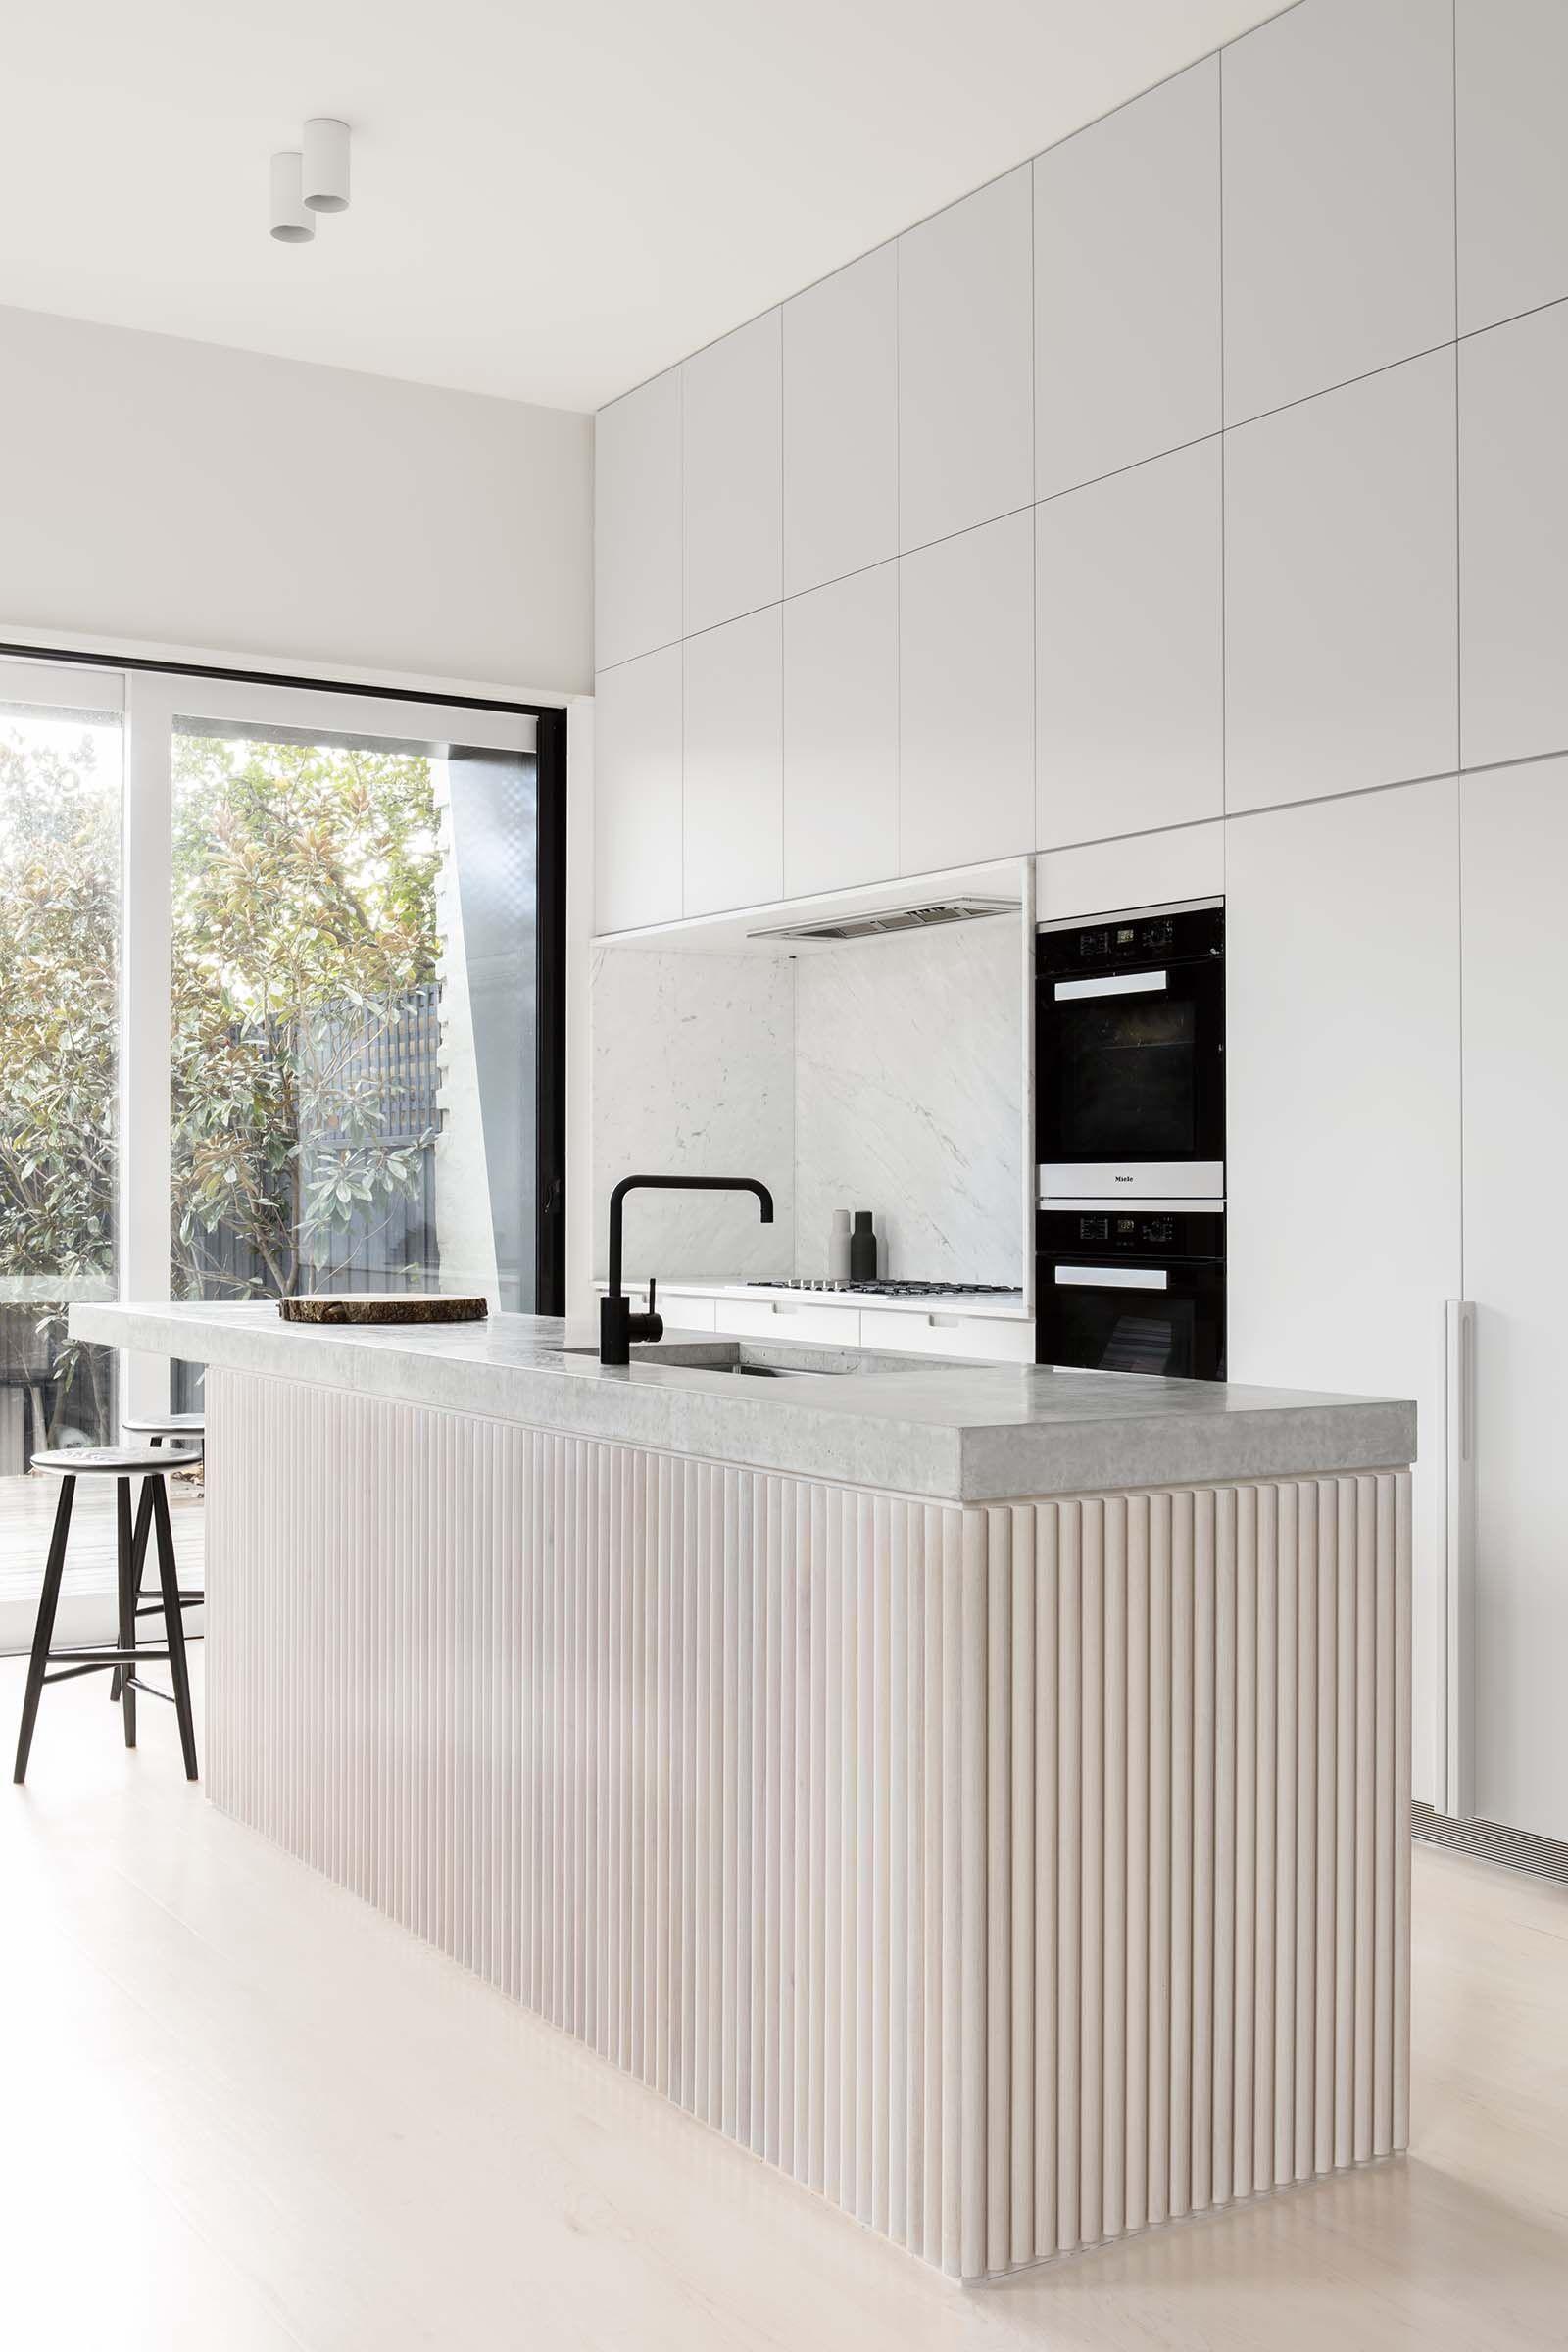 Minimalist Kitchens That Strike The Perfect Warm Balance